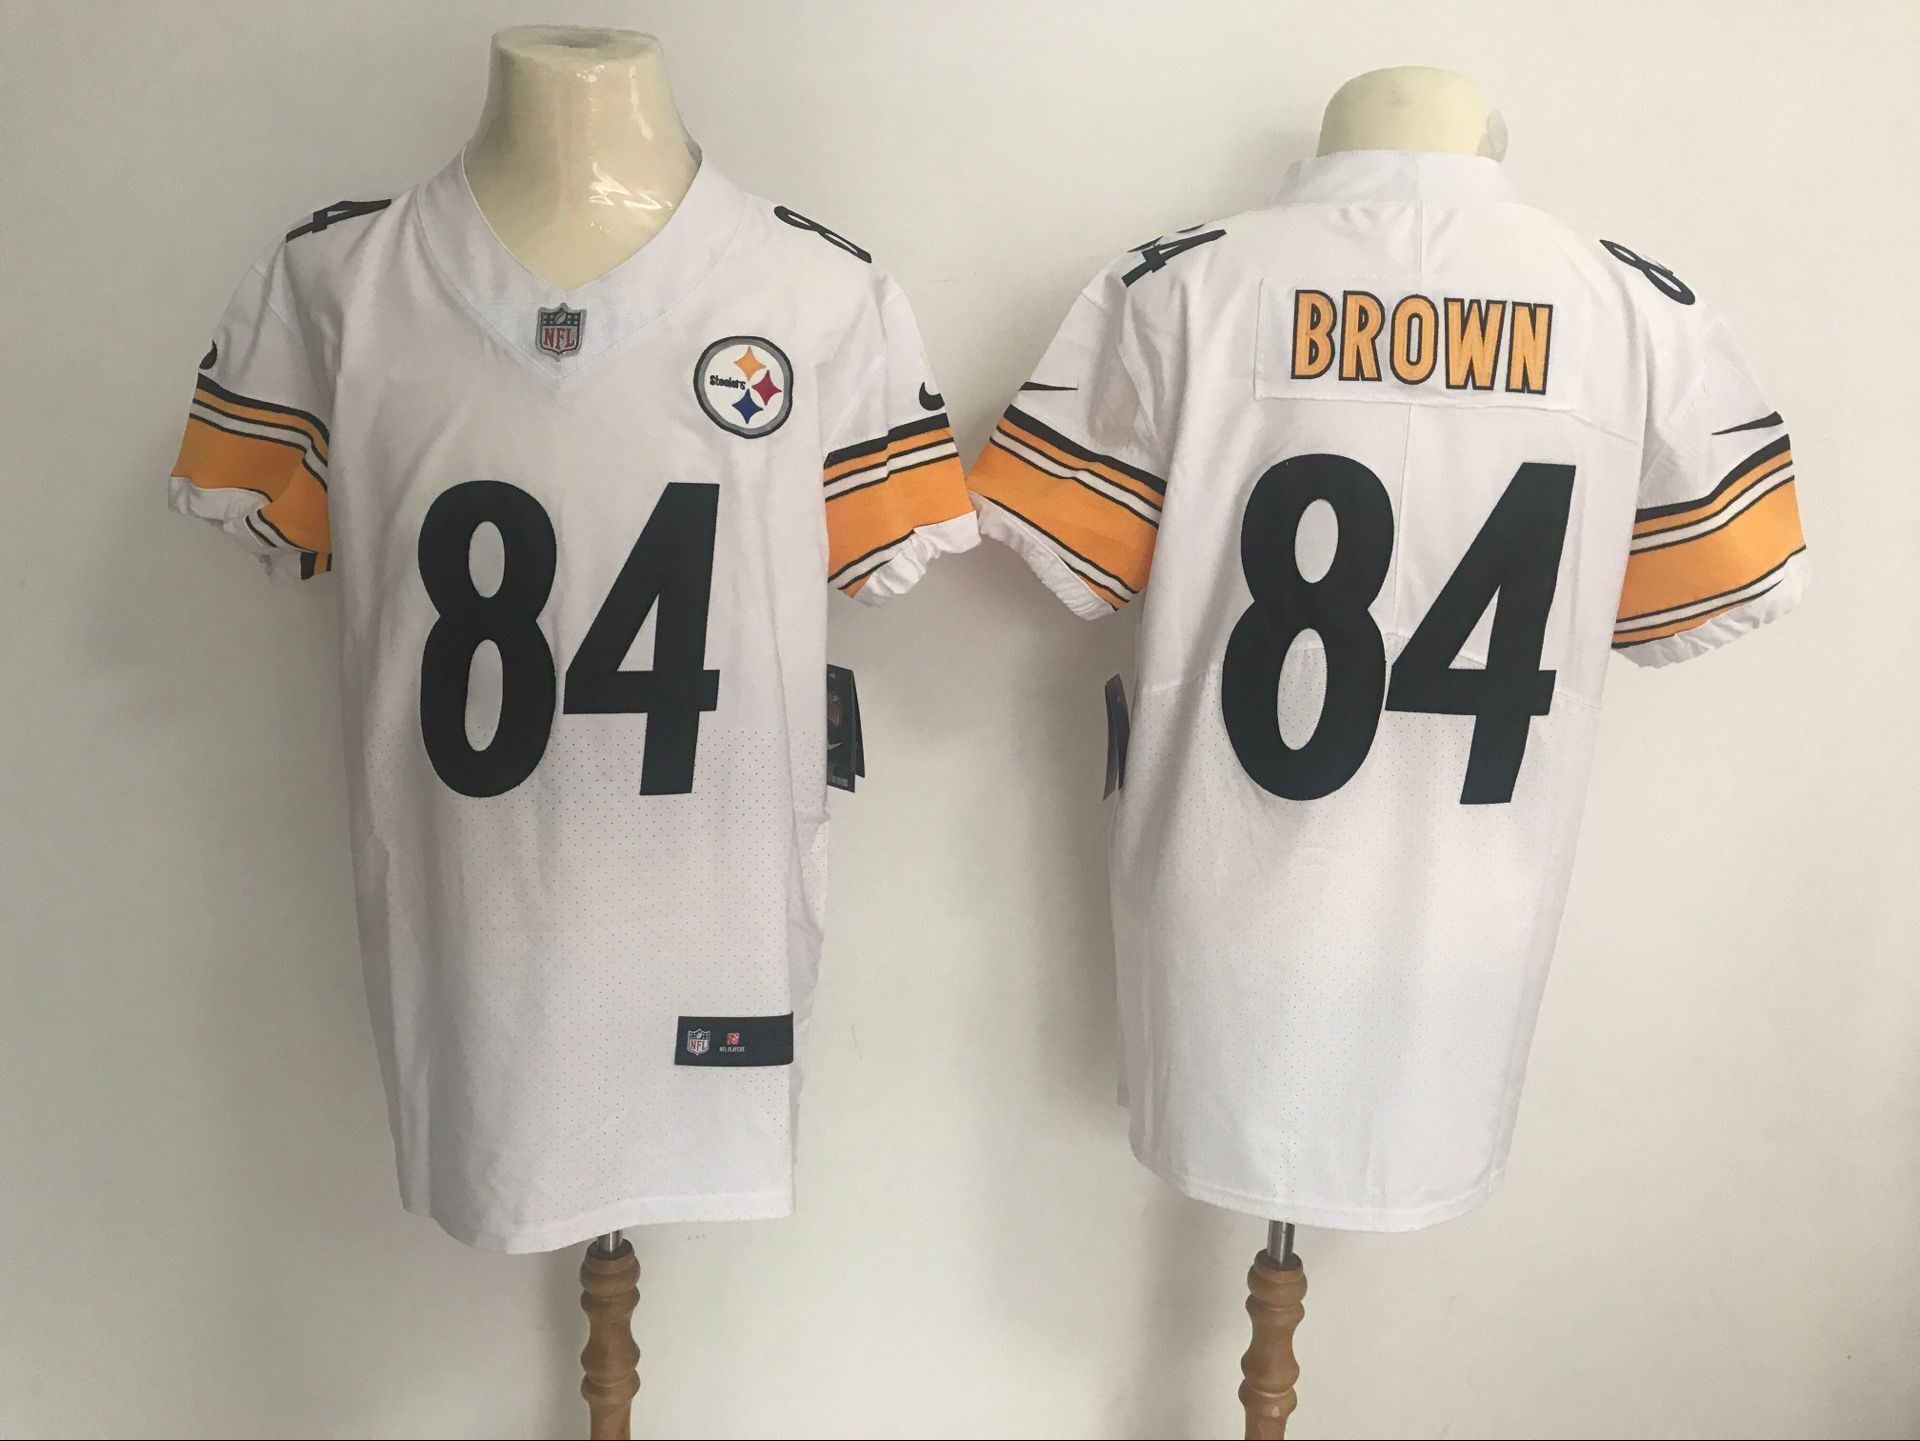 online retailer 12a1d 3dda4 Pittsburgh #Steelers #84 #Antonio#Brown White Vapor ...